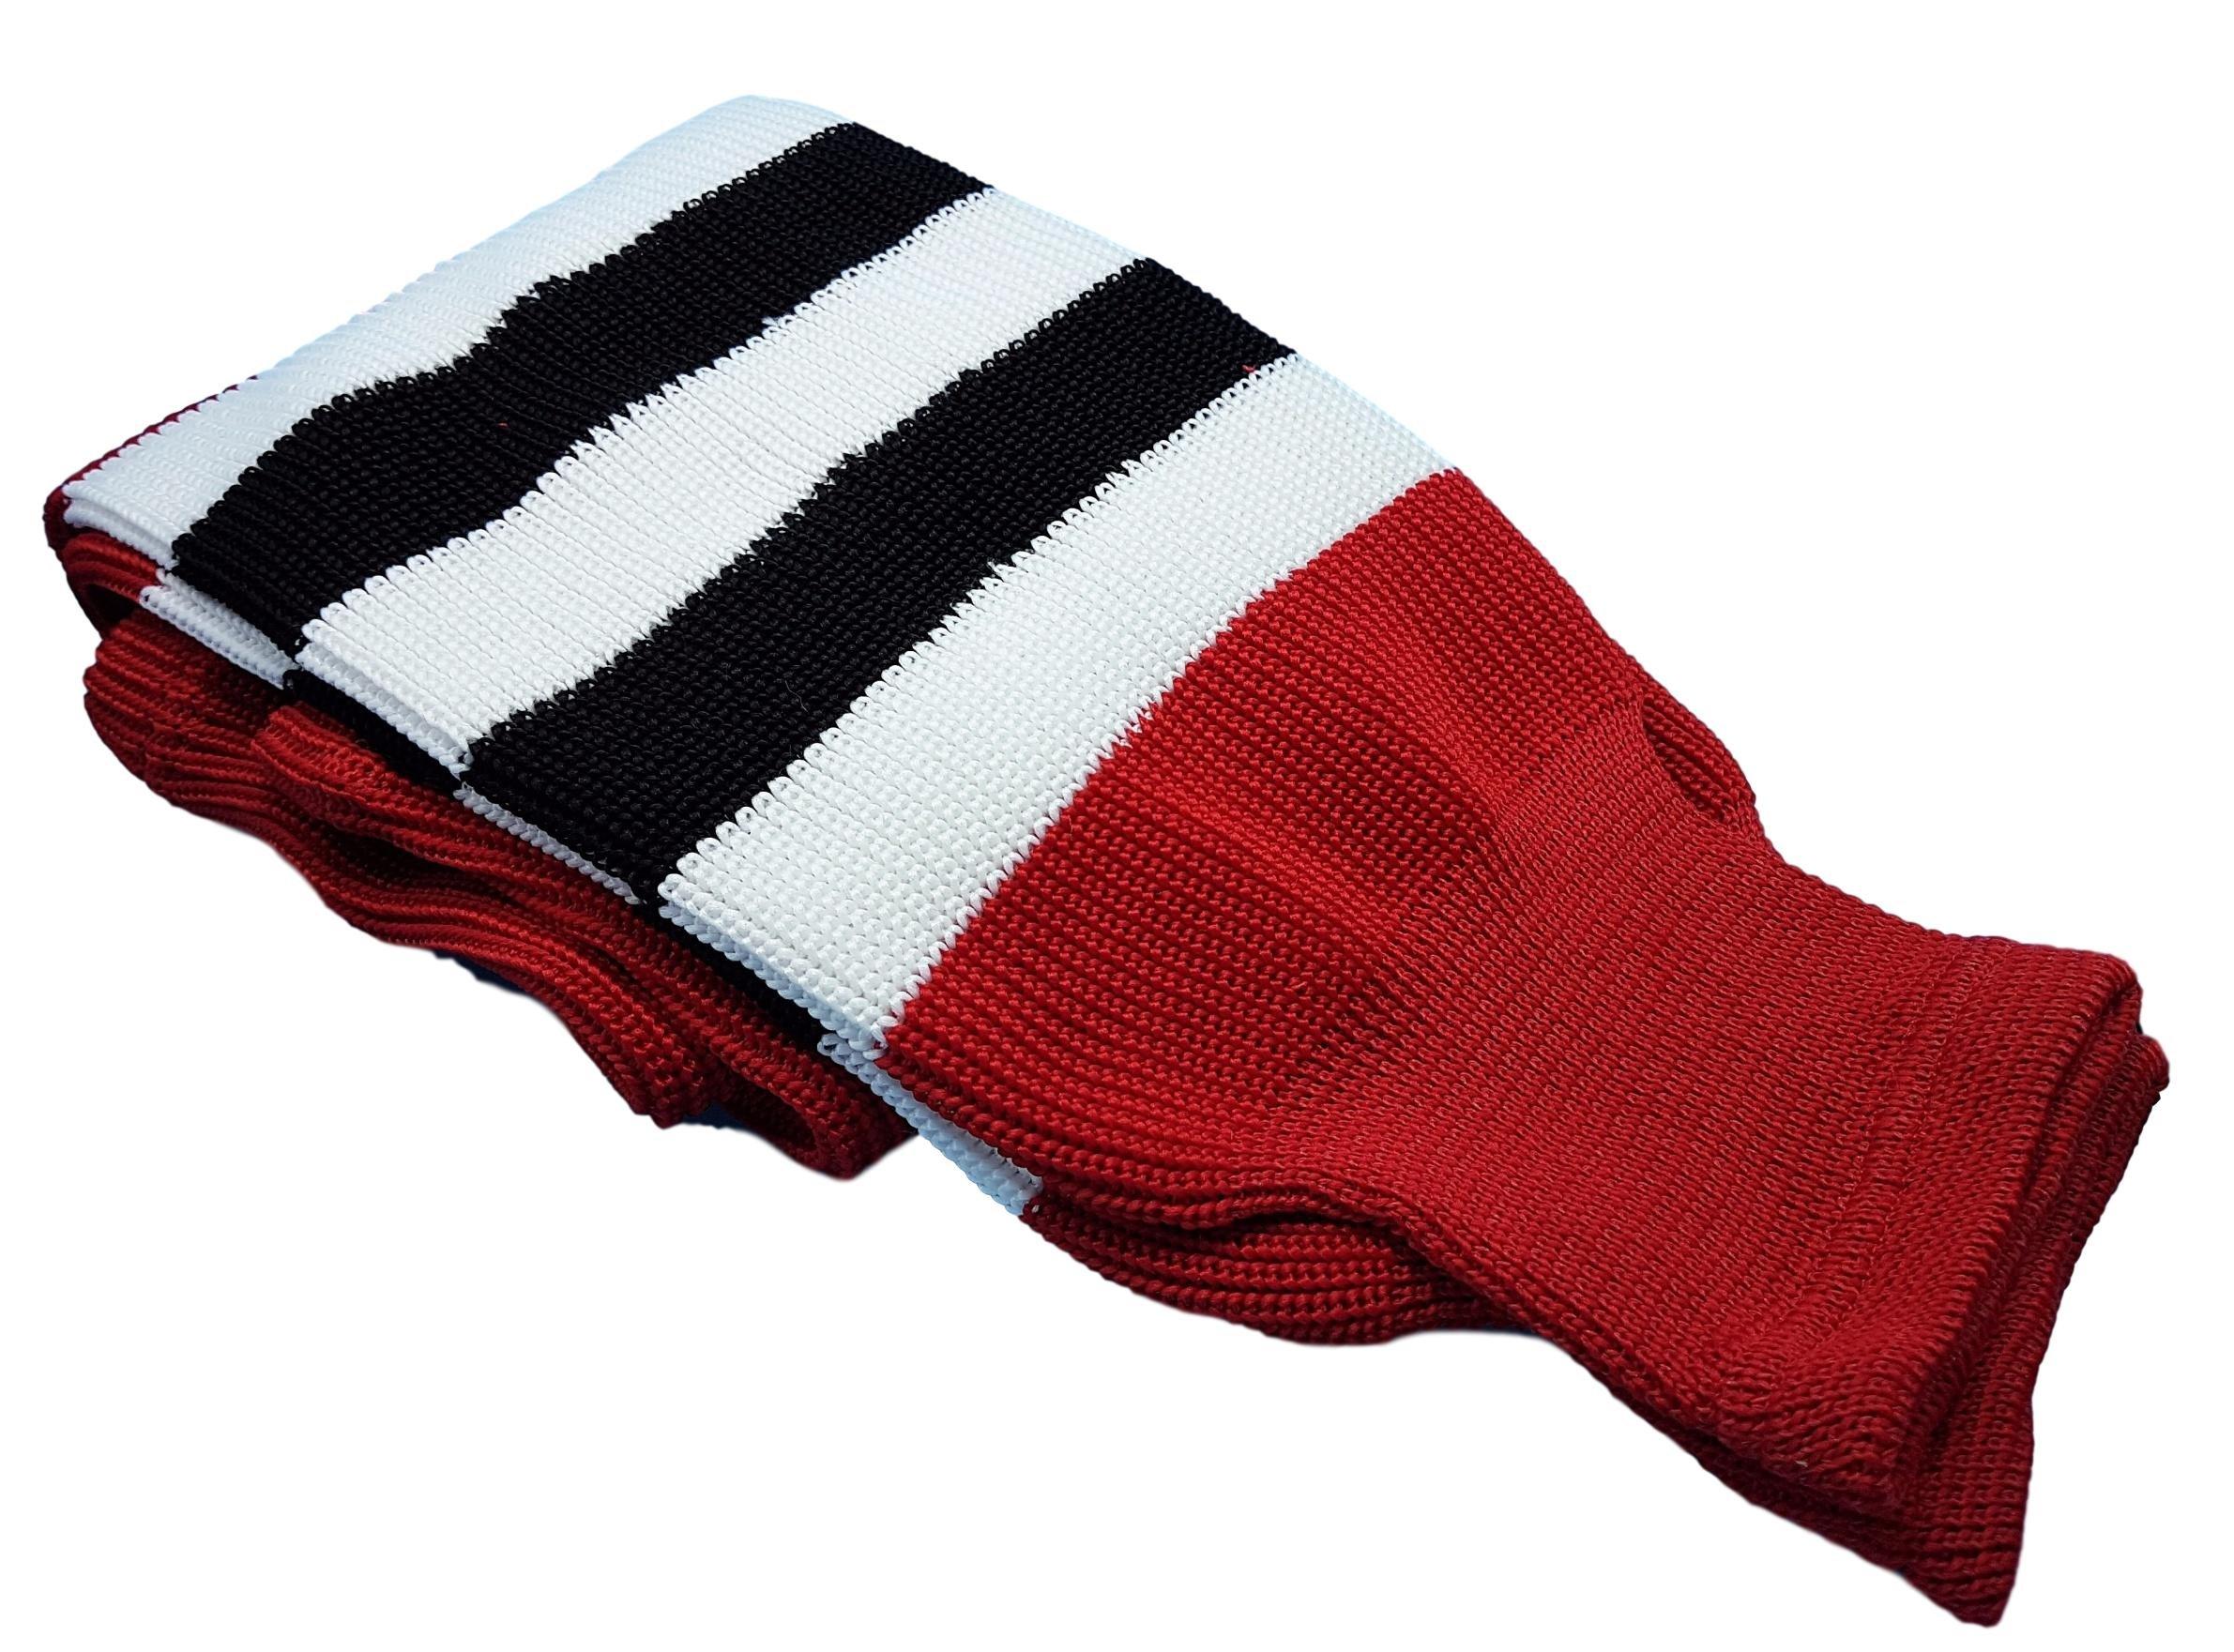 Hockey Socks Knit Made in Canada for Hockey Players (Senior 32'', 8 Red w/Black/White)